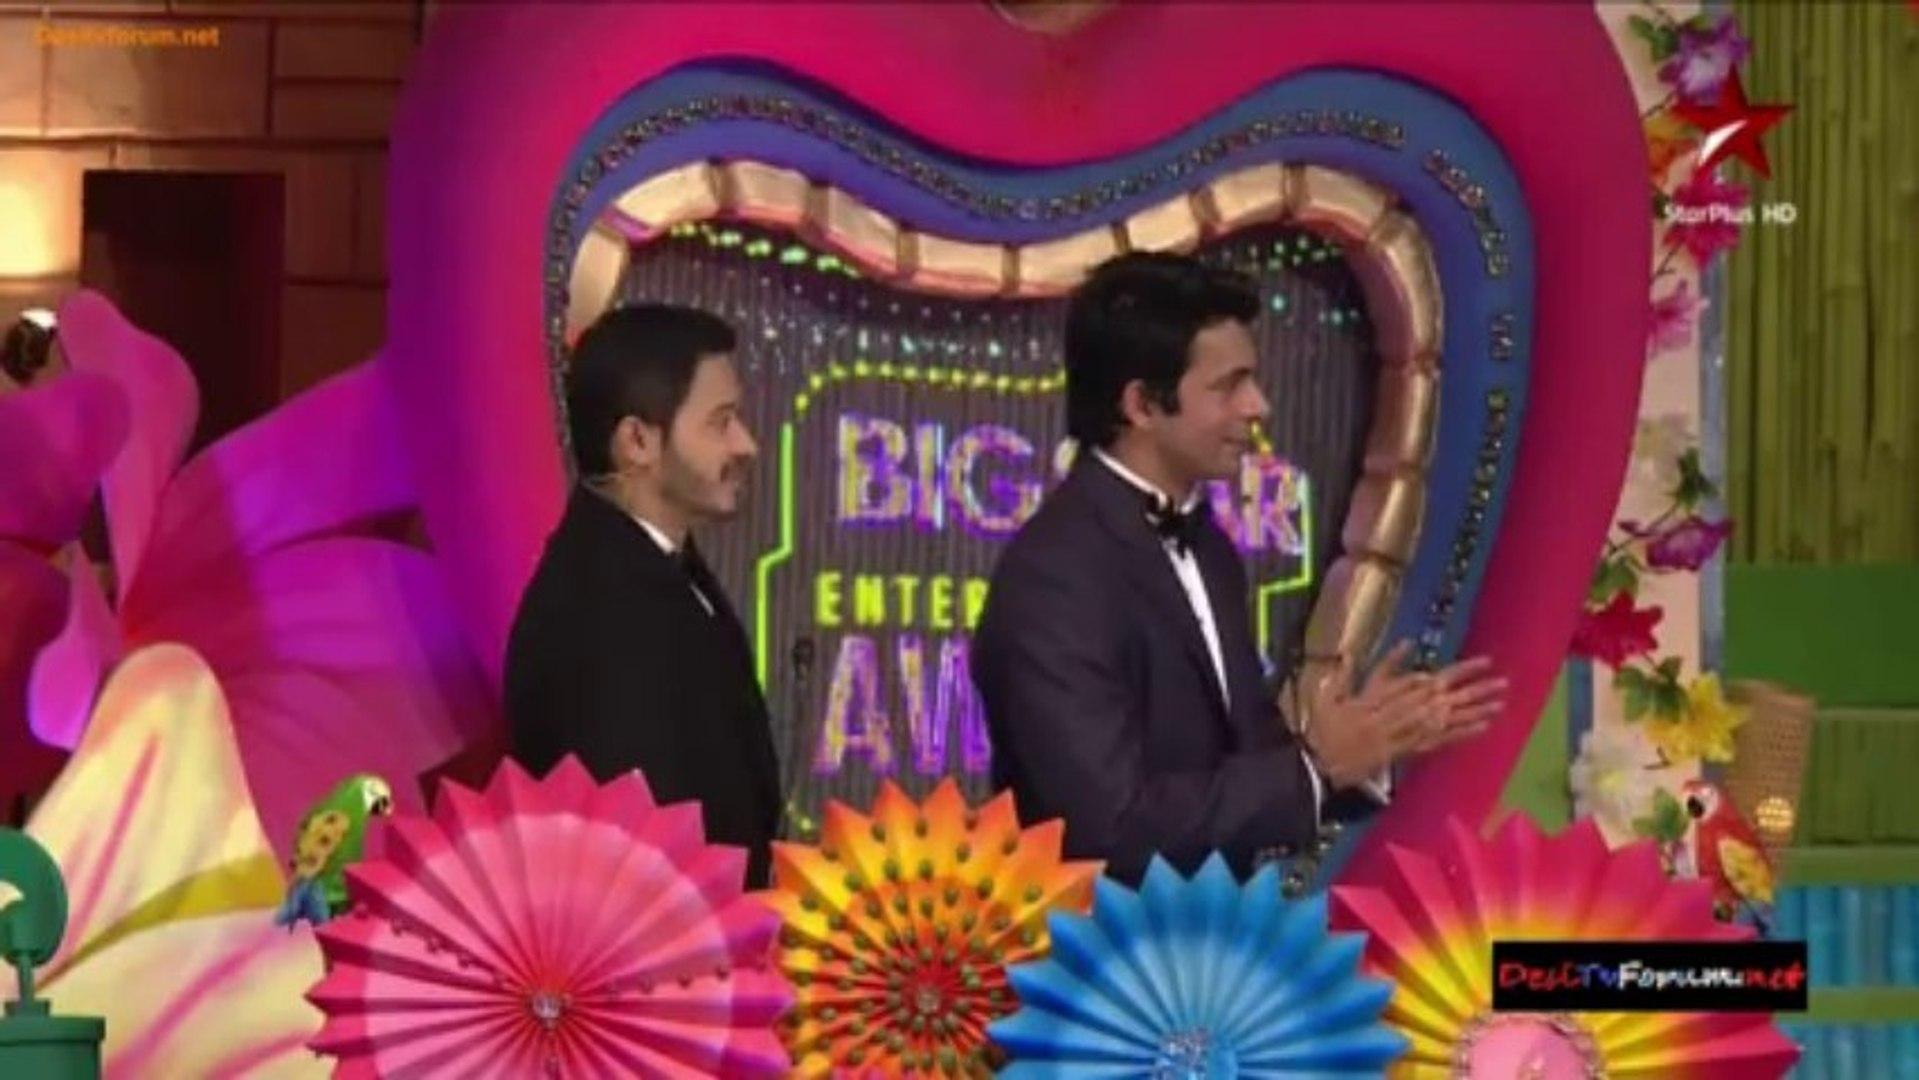 Big Star Entertainment Awards 2013 - Main Event 720p 31st December 2013 Video Watch Online HD Pt10